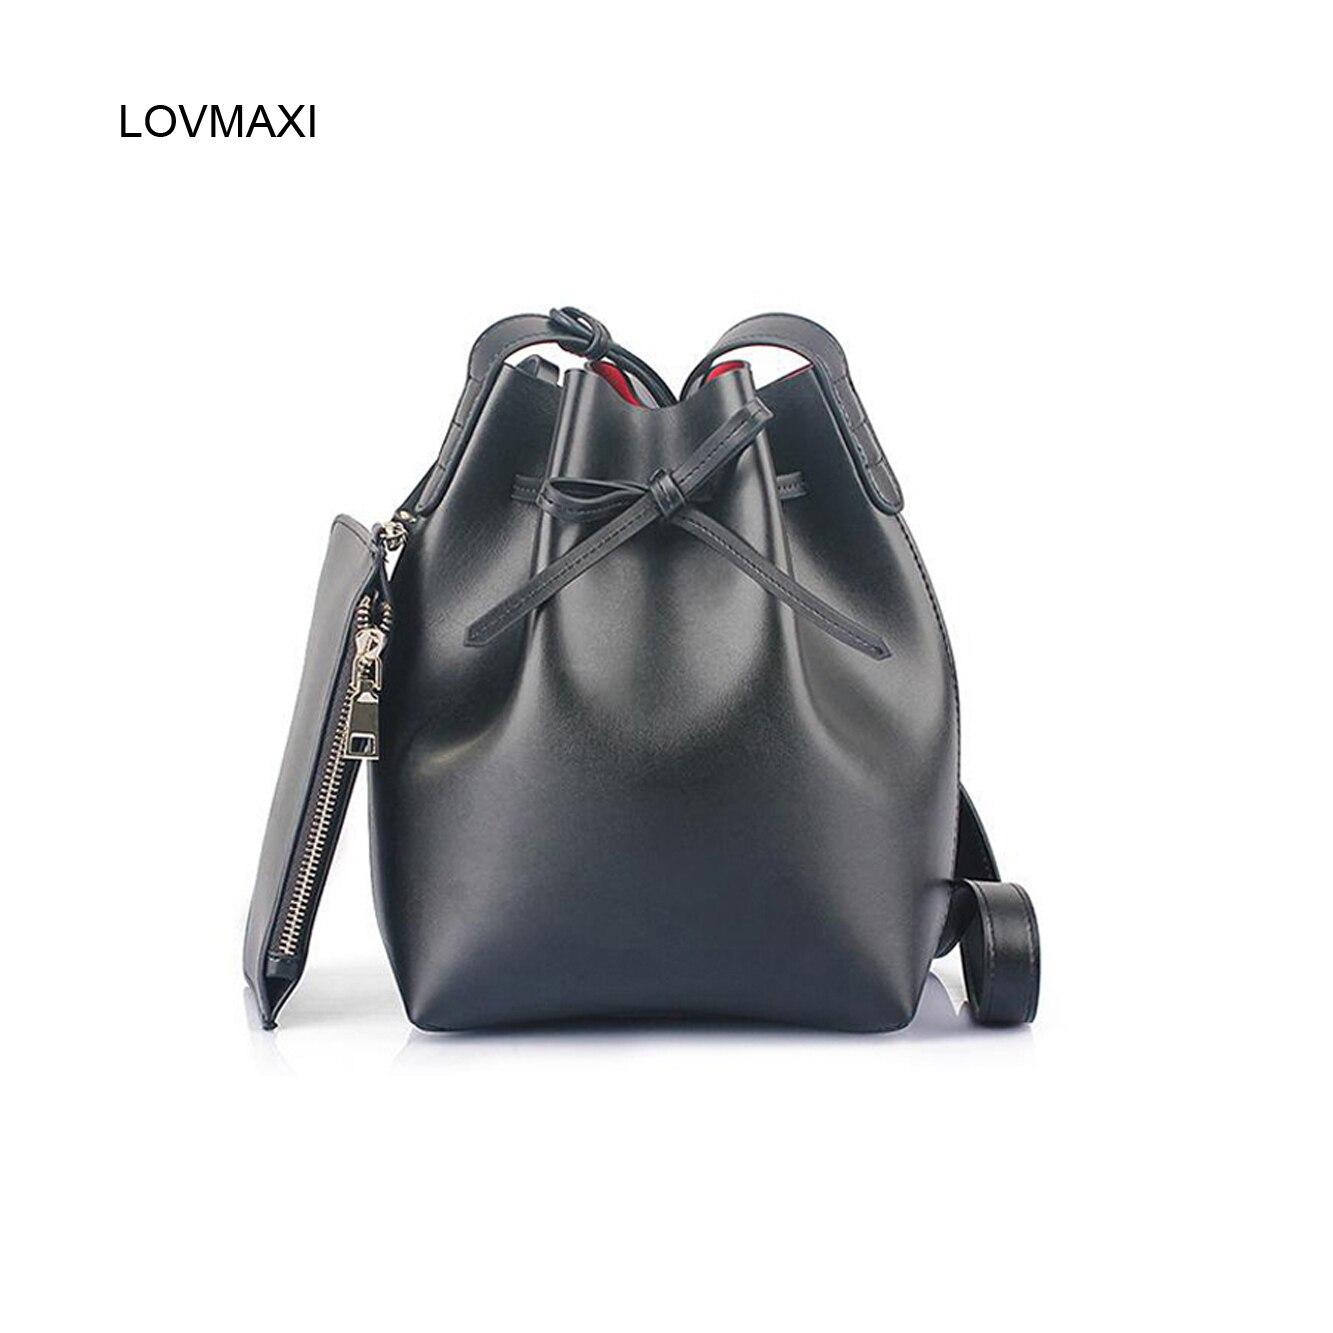 ФОТО Fashion female shoulder bags bow messenger bags women's genuine leather handbag bucket lady 2017 new